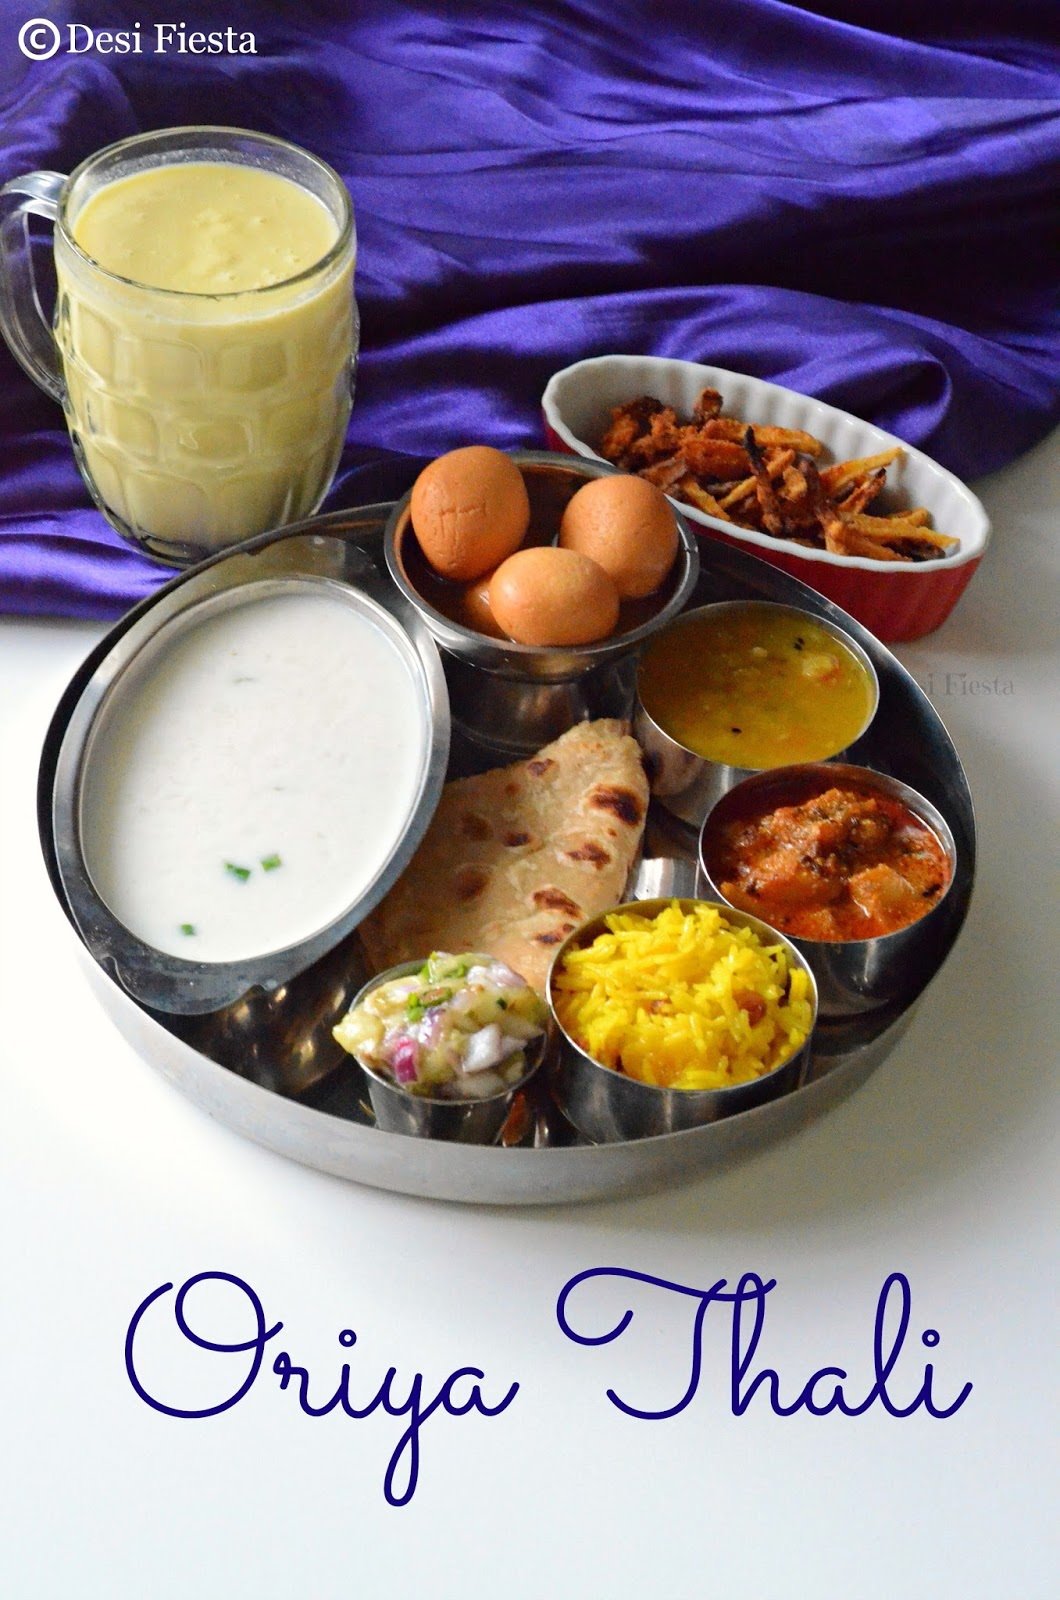 Oriya thali orissa cuisine desi fiesta orissa cuisine oriya thali forumfinder Image collections